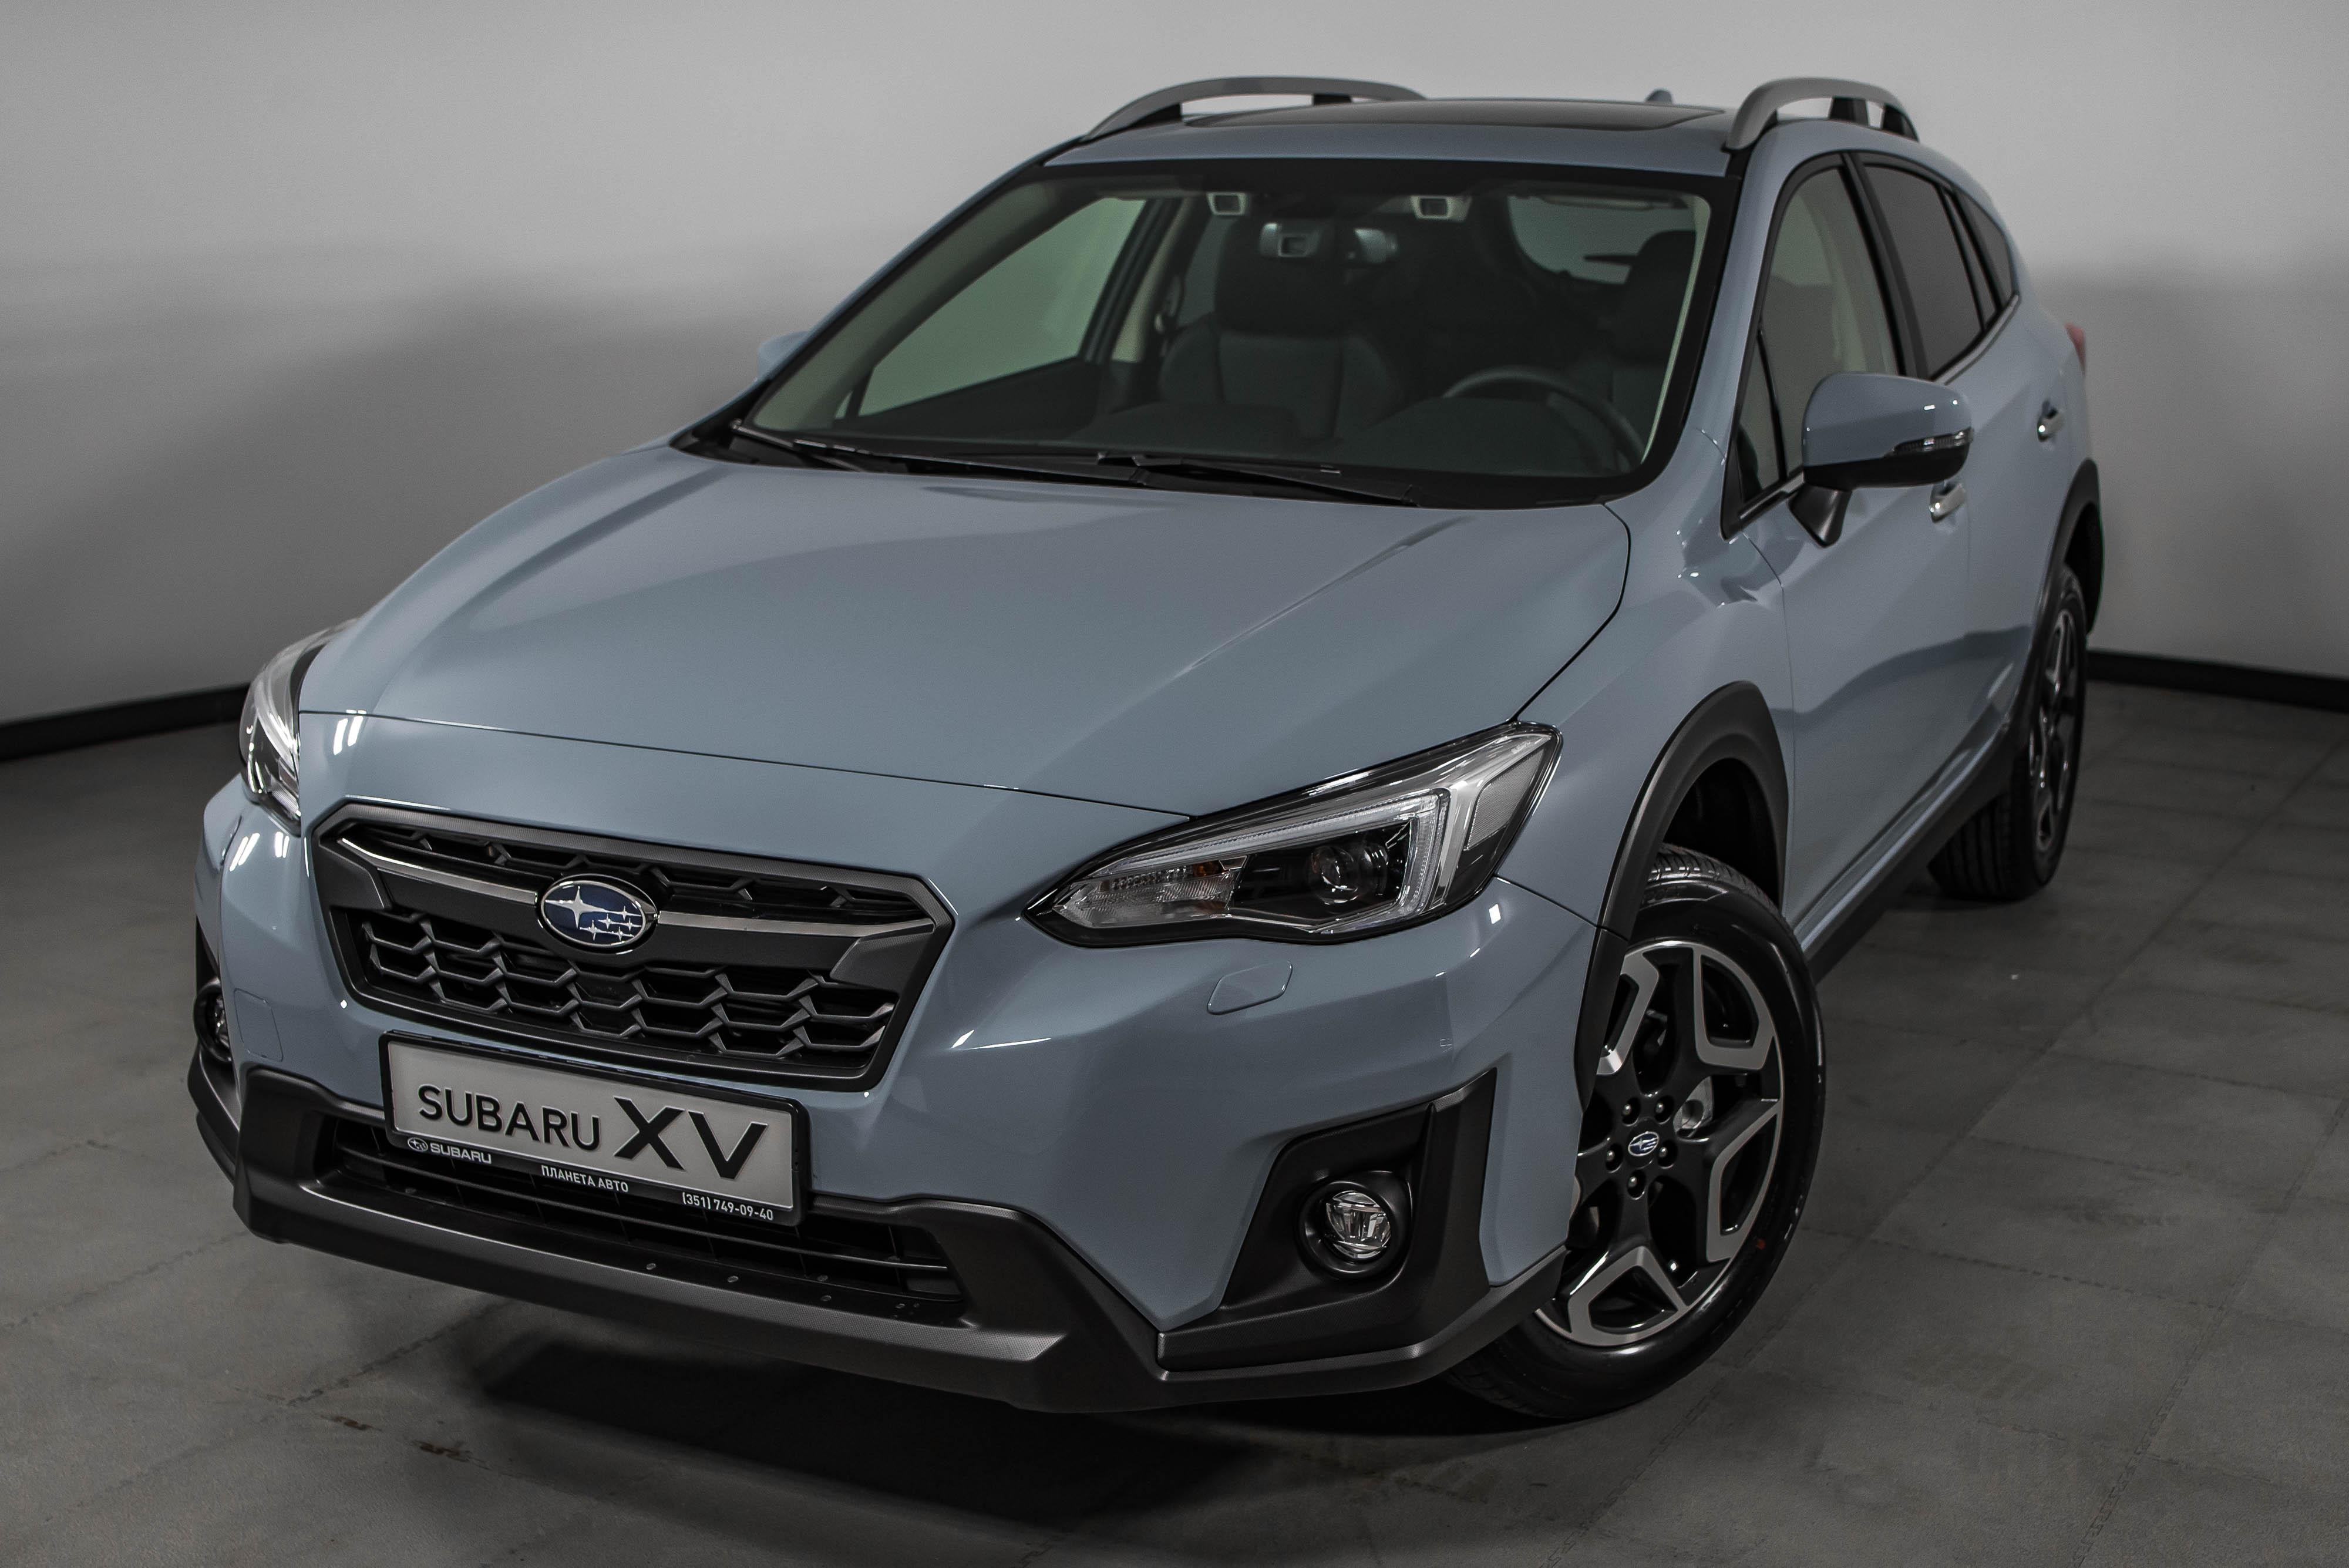 Subaru XV 2.0i-S ES AWD CVT (150 л. с.) Premium ES